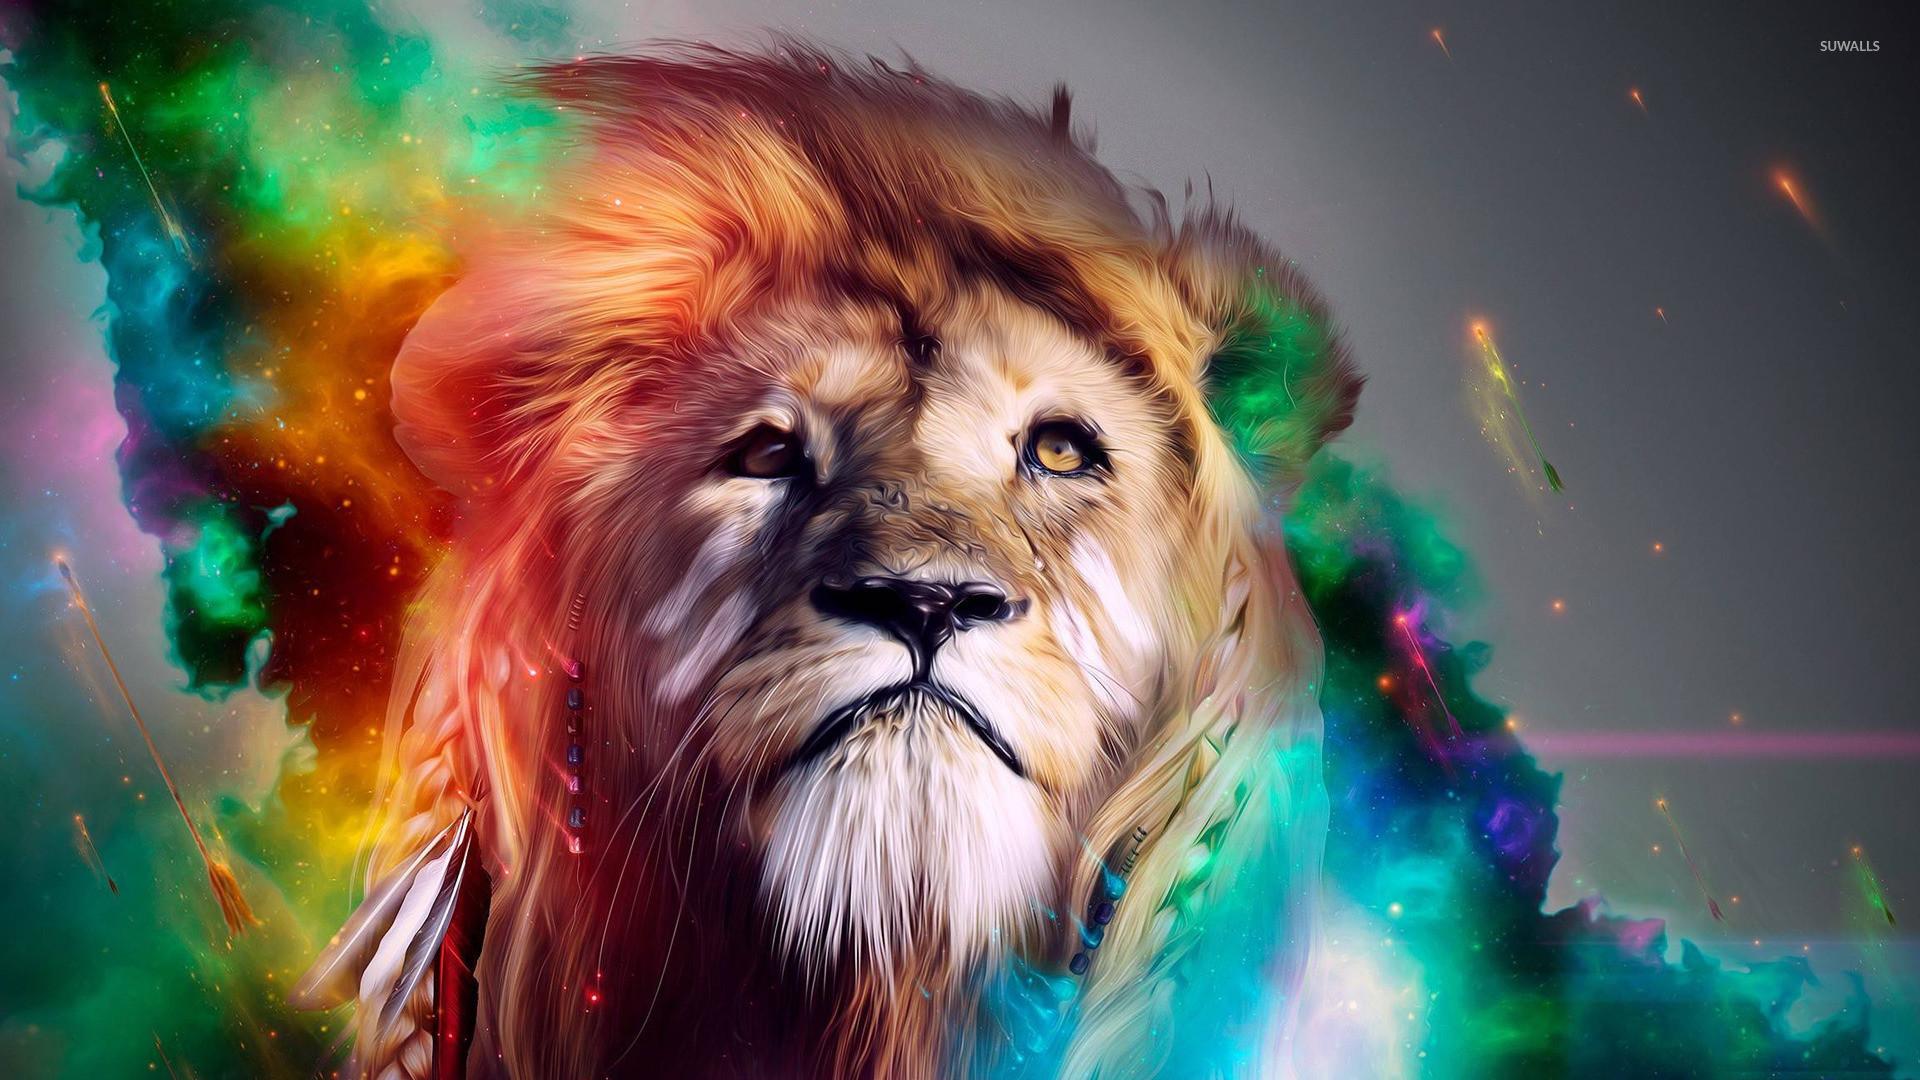 Colorful lion wallpaper – Digital Art wallpapers – #15854